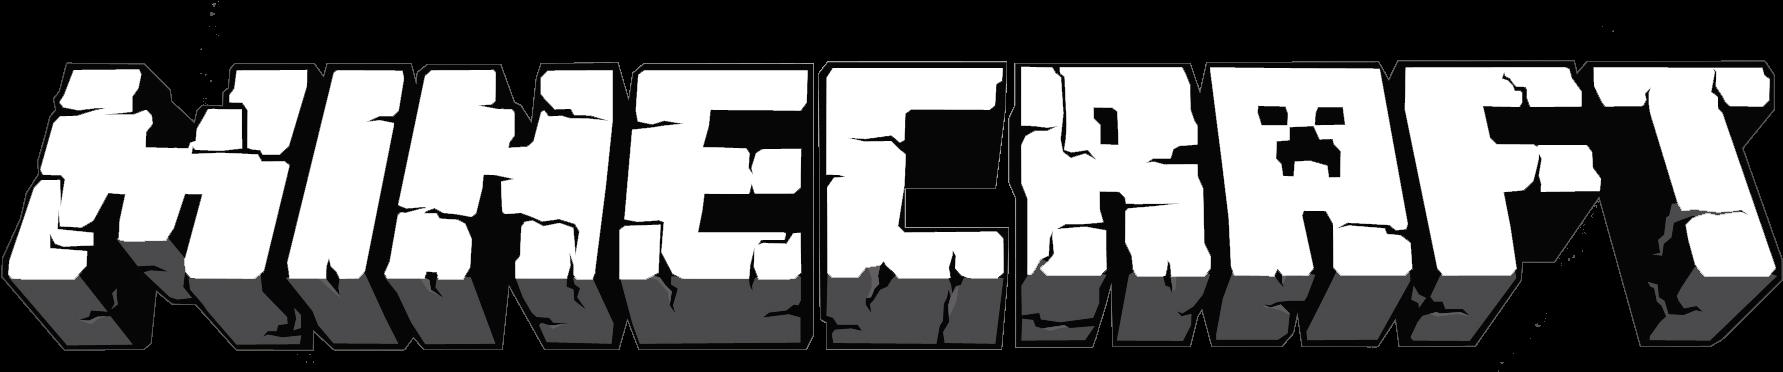 Download Minecraft Logo Transparent - Full Size PNG Image ...